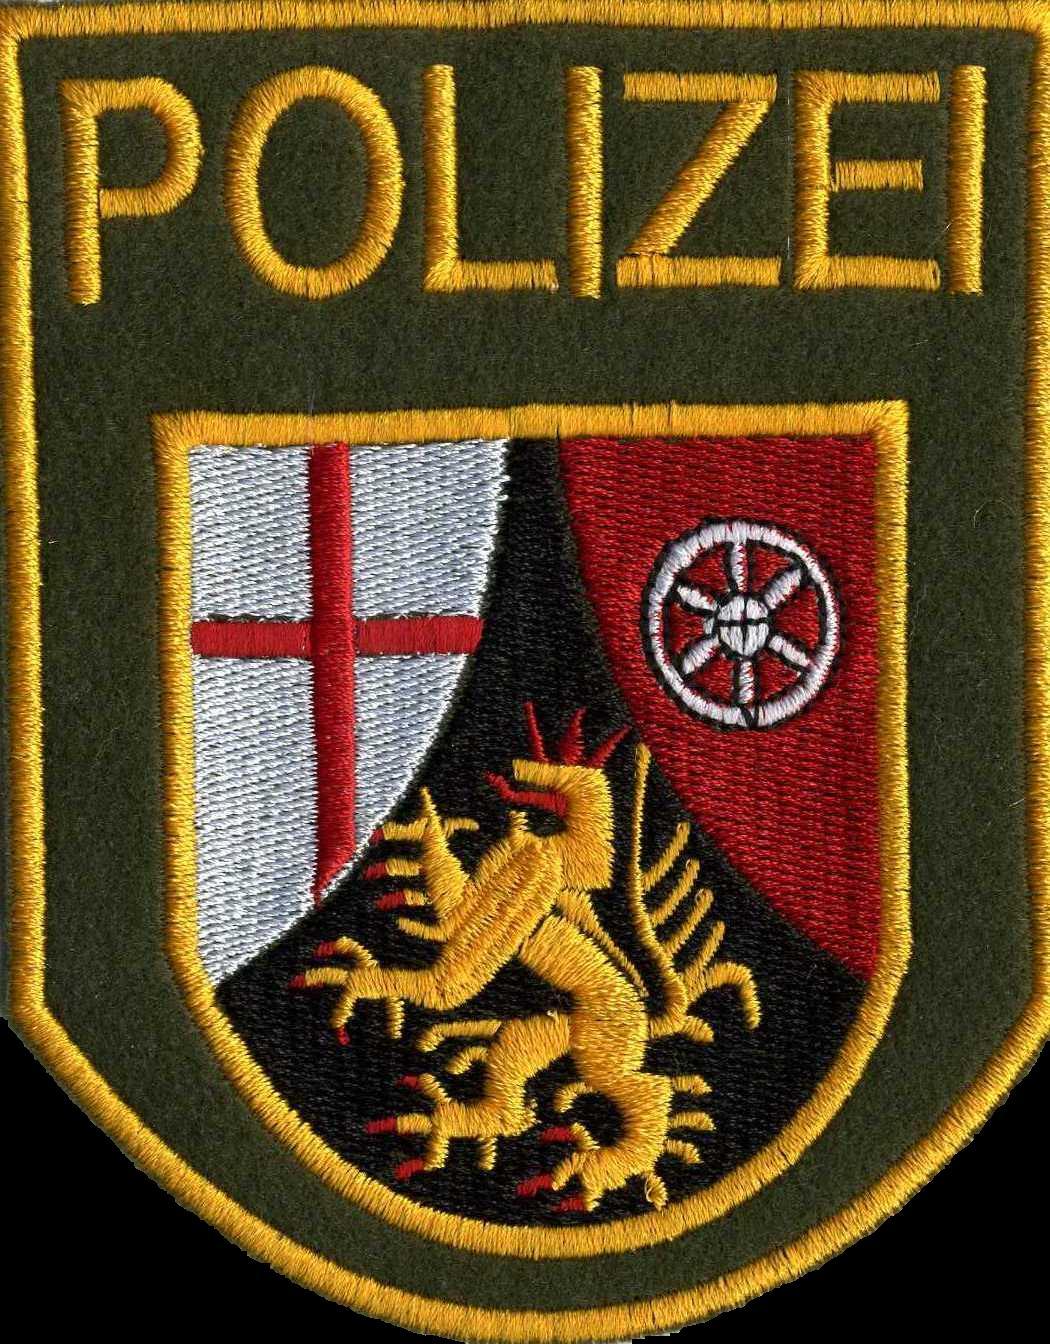 polizei emblem